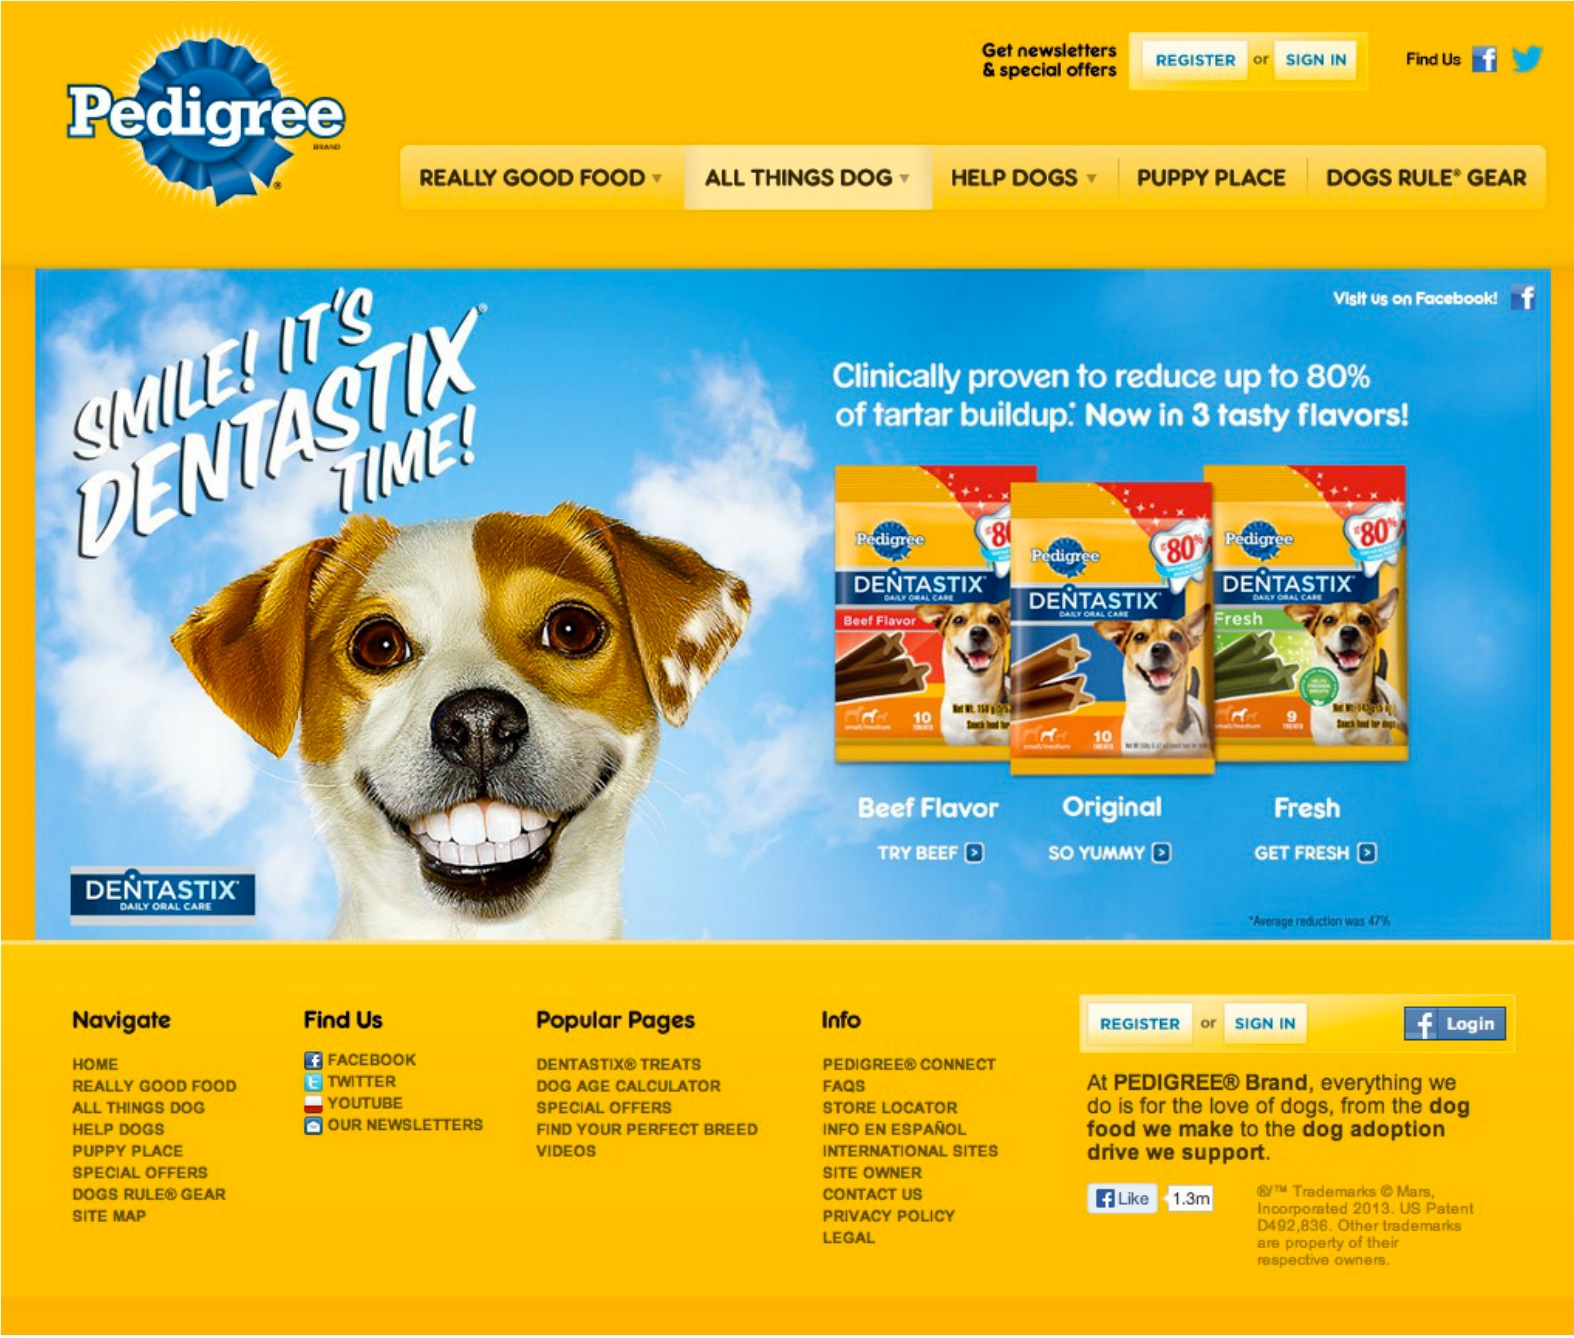 Images of Pedigree Dog Age Calculator - #rock-cafe